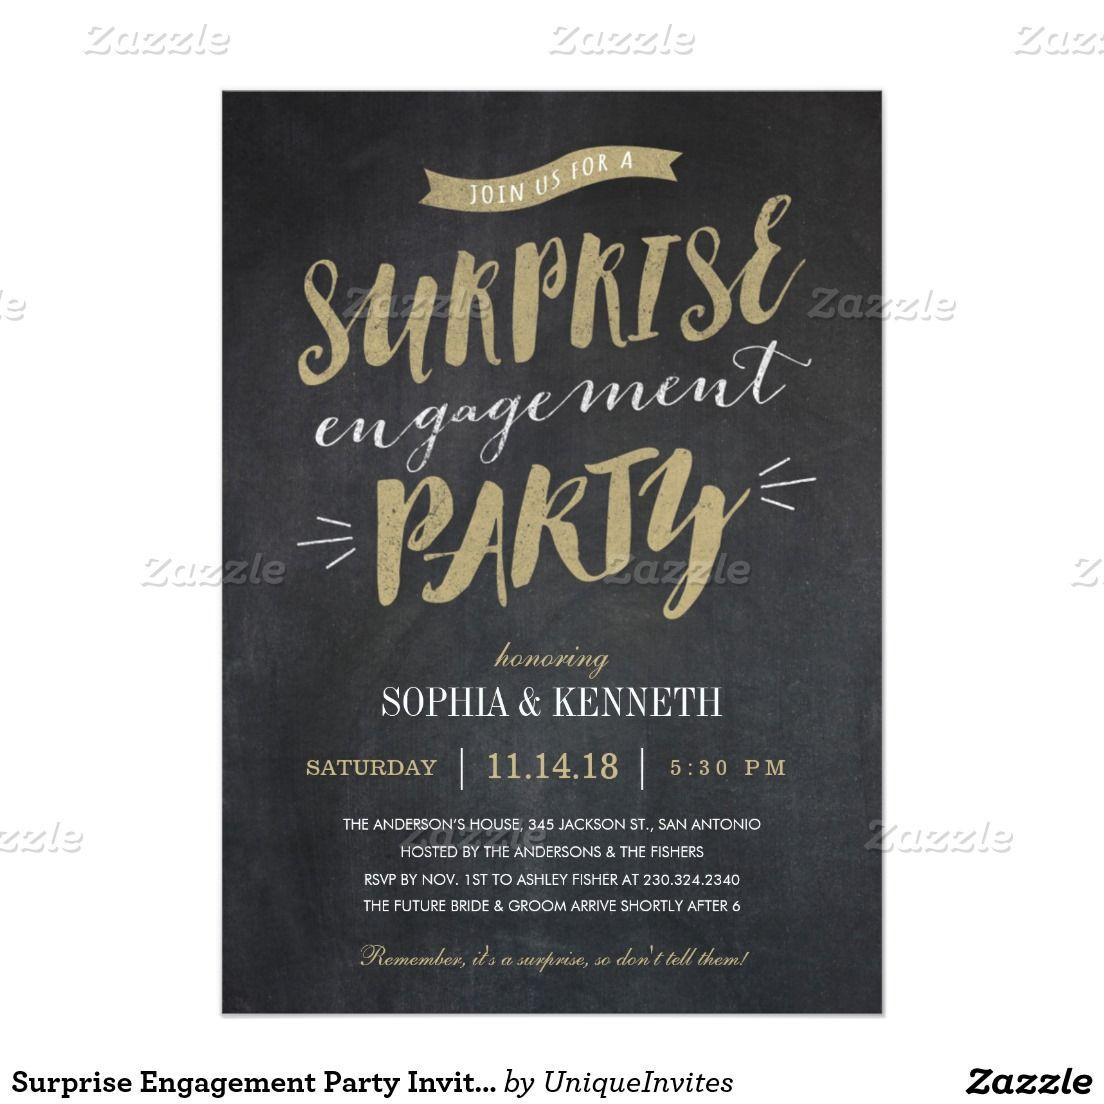 Surprise Engagement Party Invitations